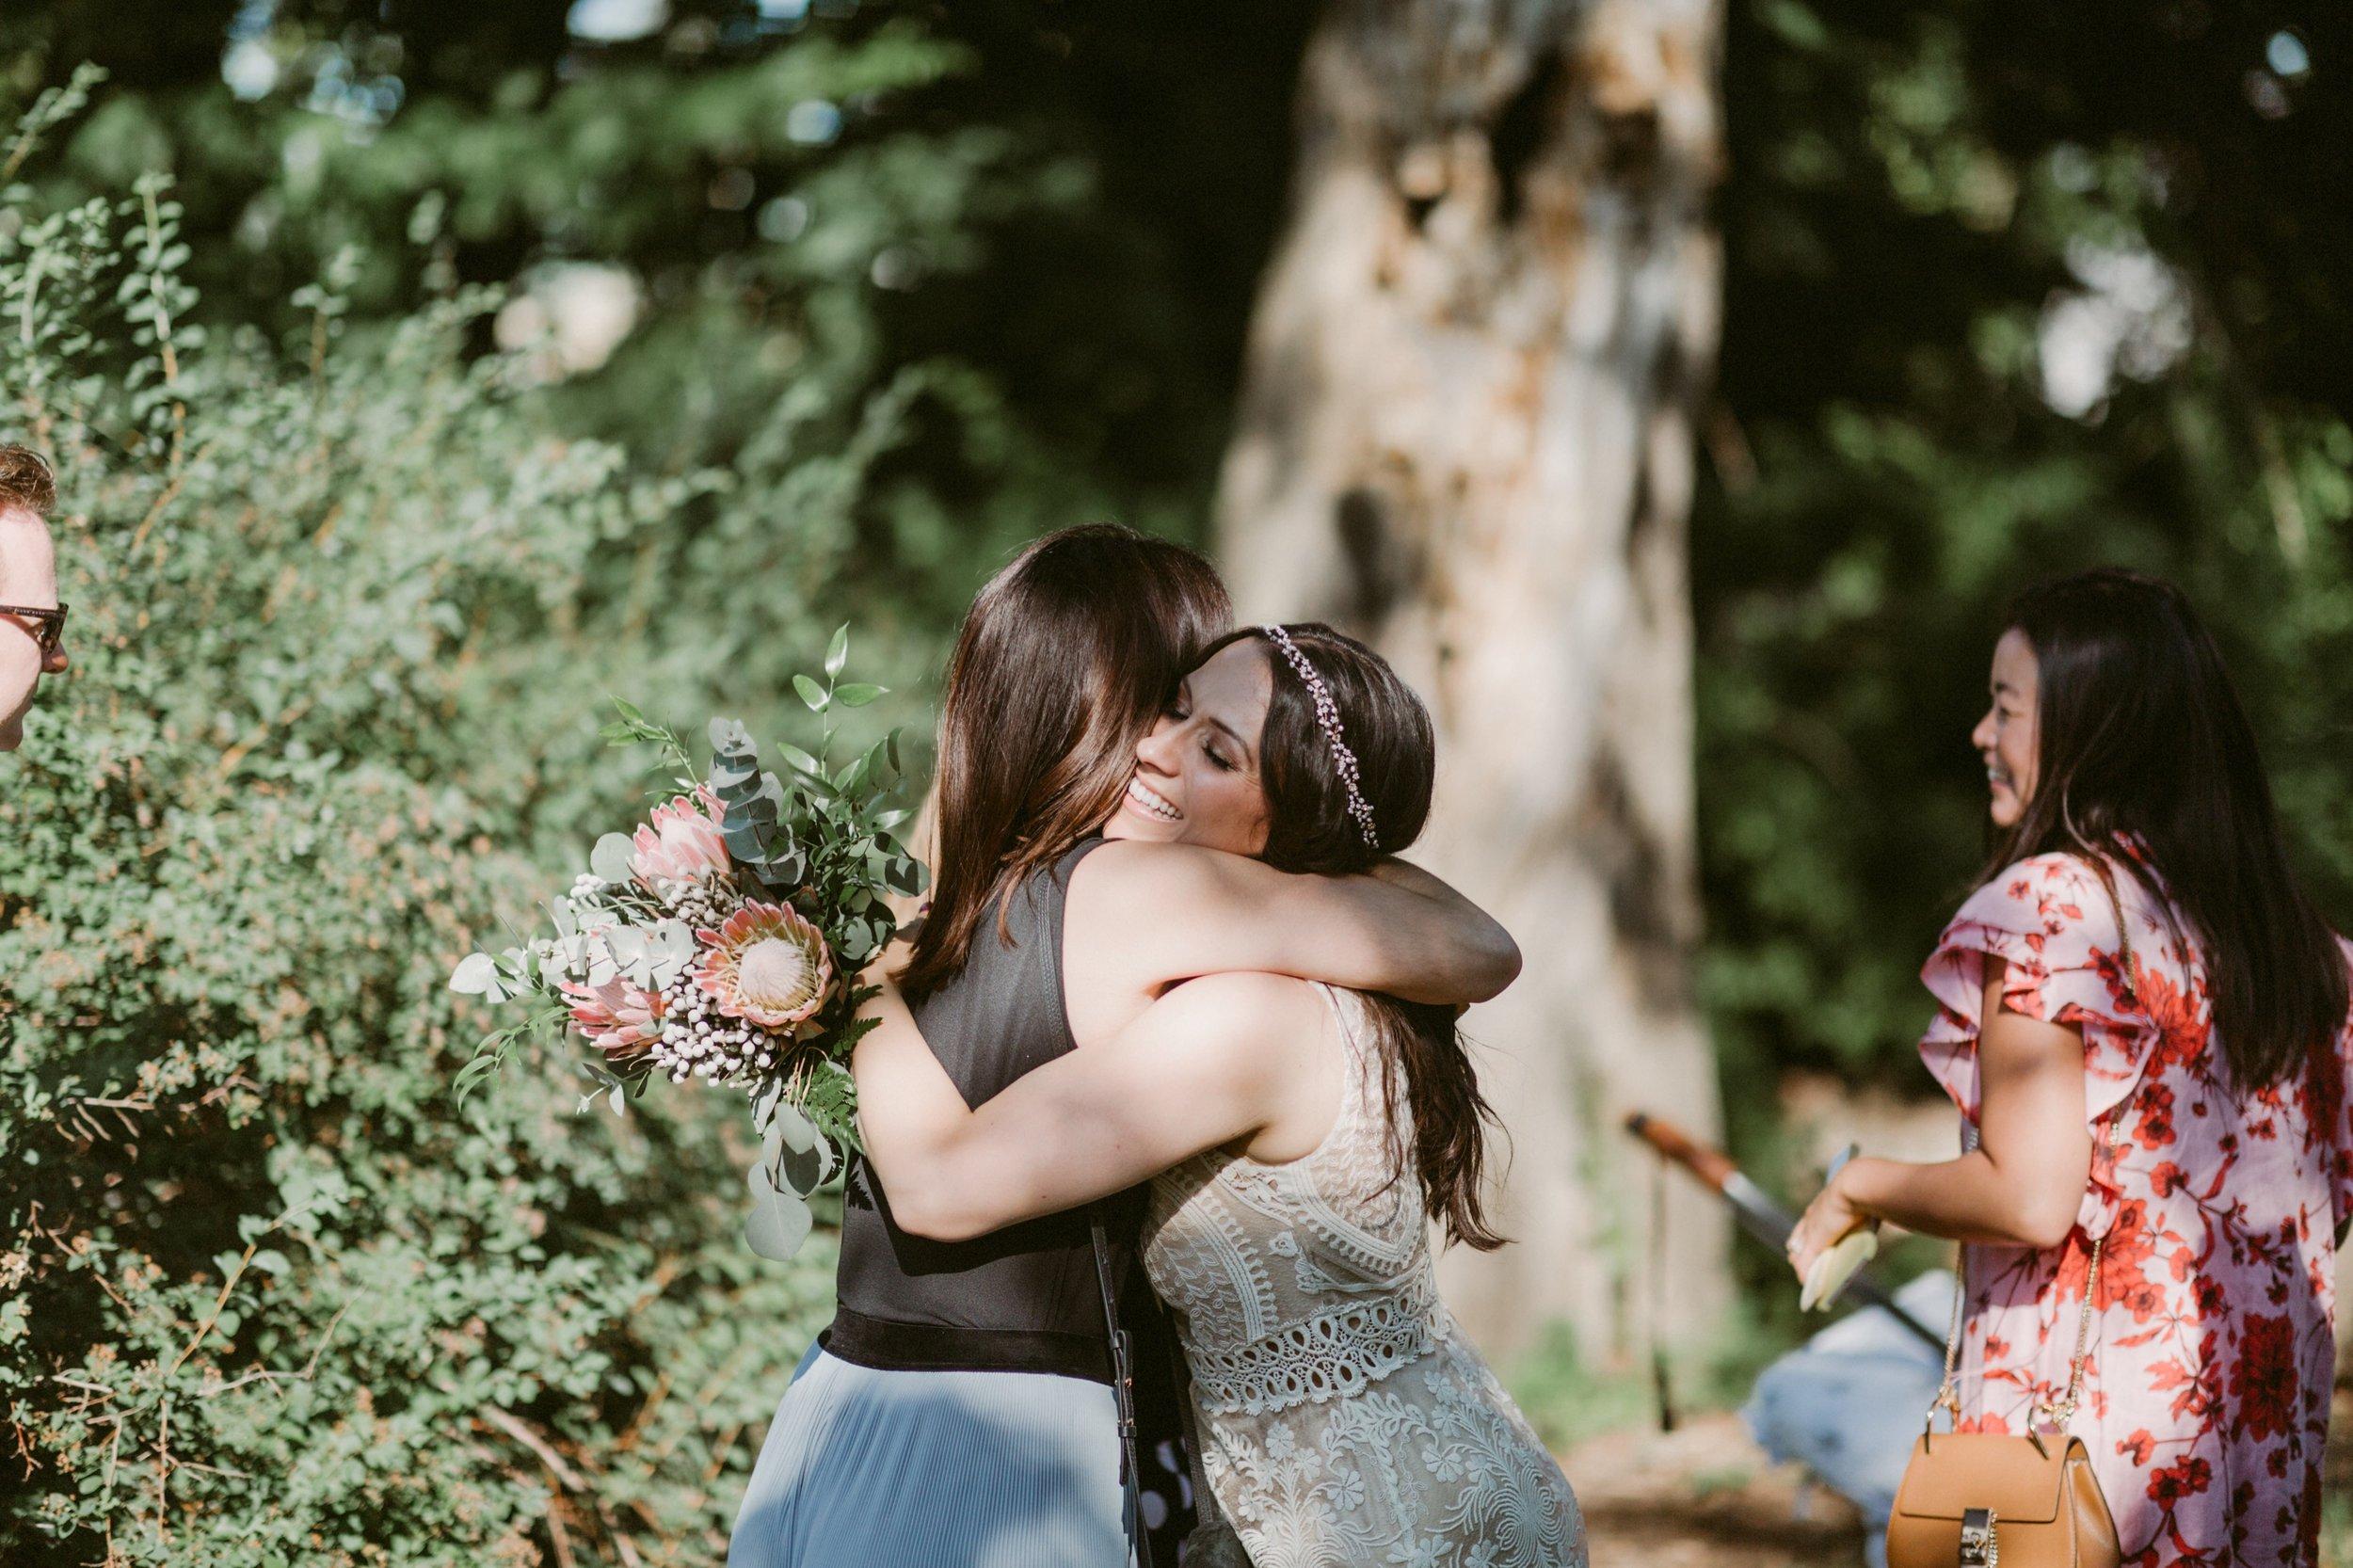 039_Spadina House Wedding (225 of 748)_House_Spadina_intimate_Toronto_Wedding.jpg